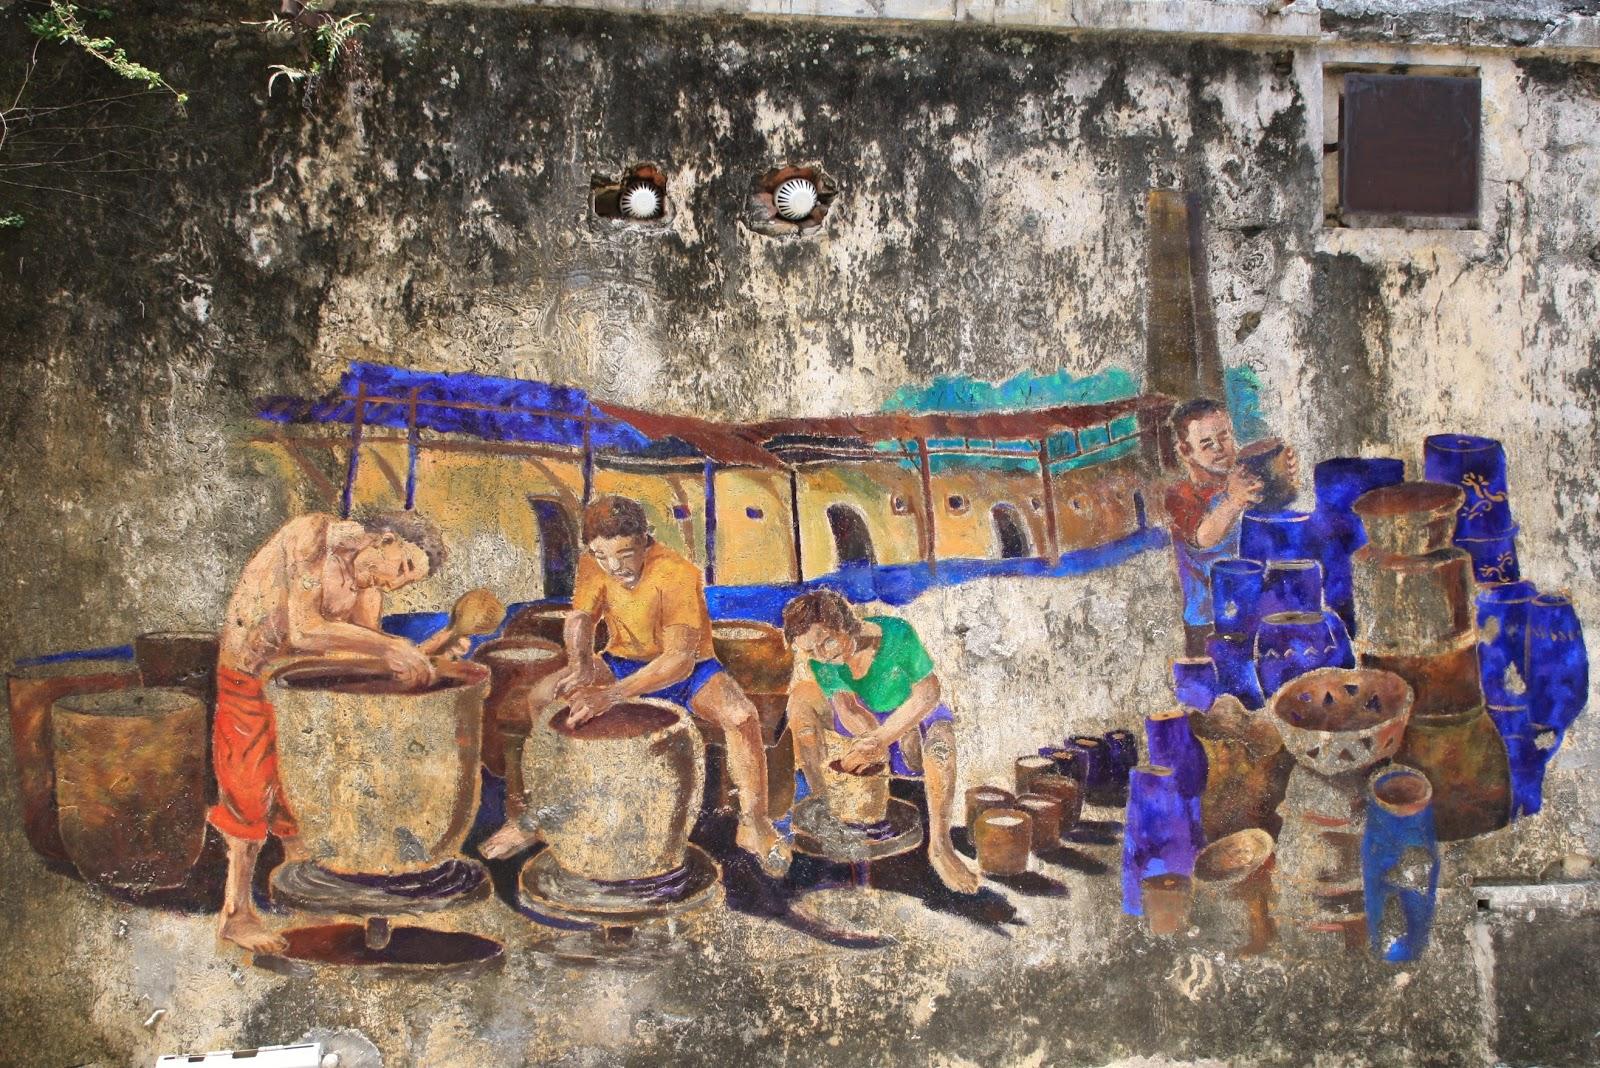 Wall art of ipoh